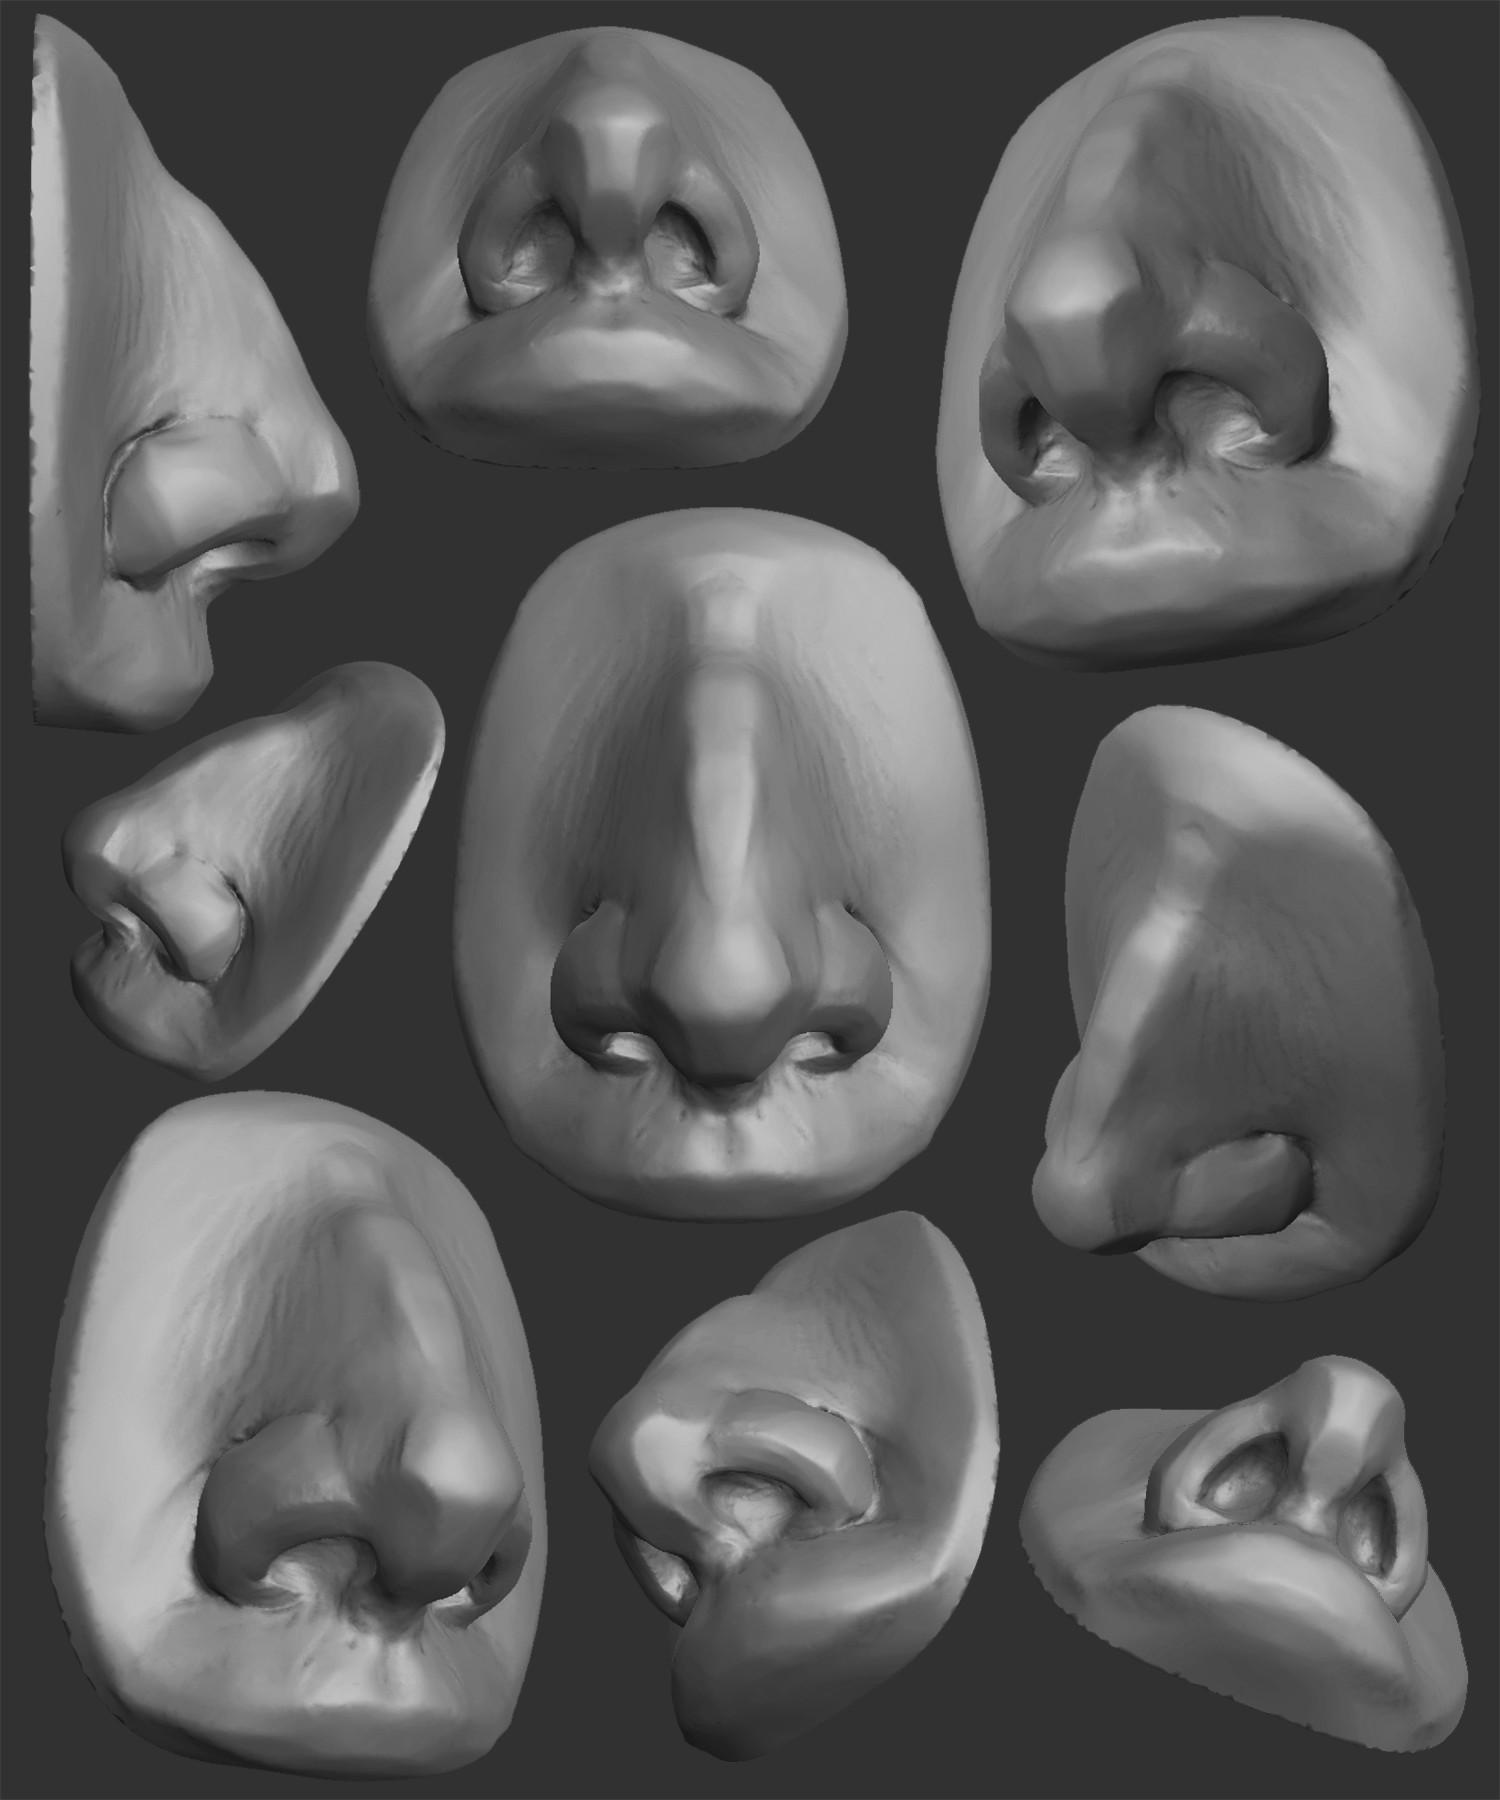 Sculpting The Nose - Speed Sculpt In Blender